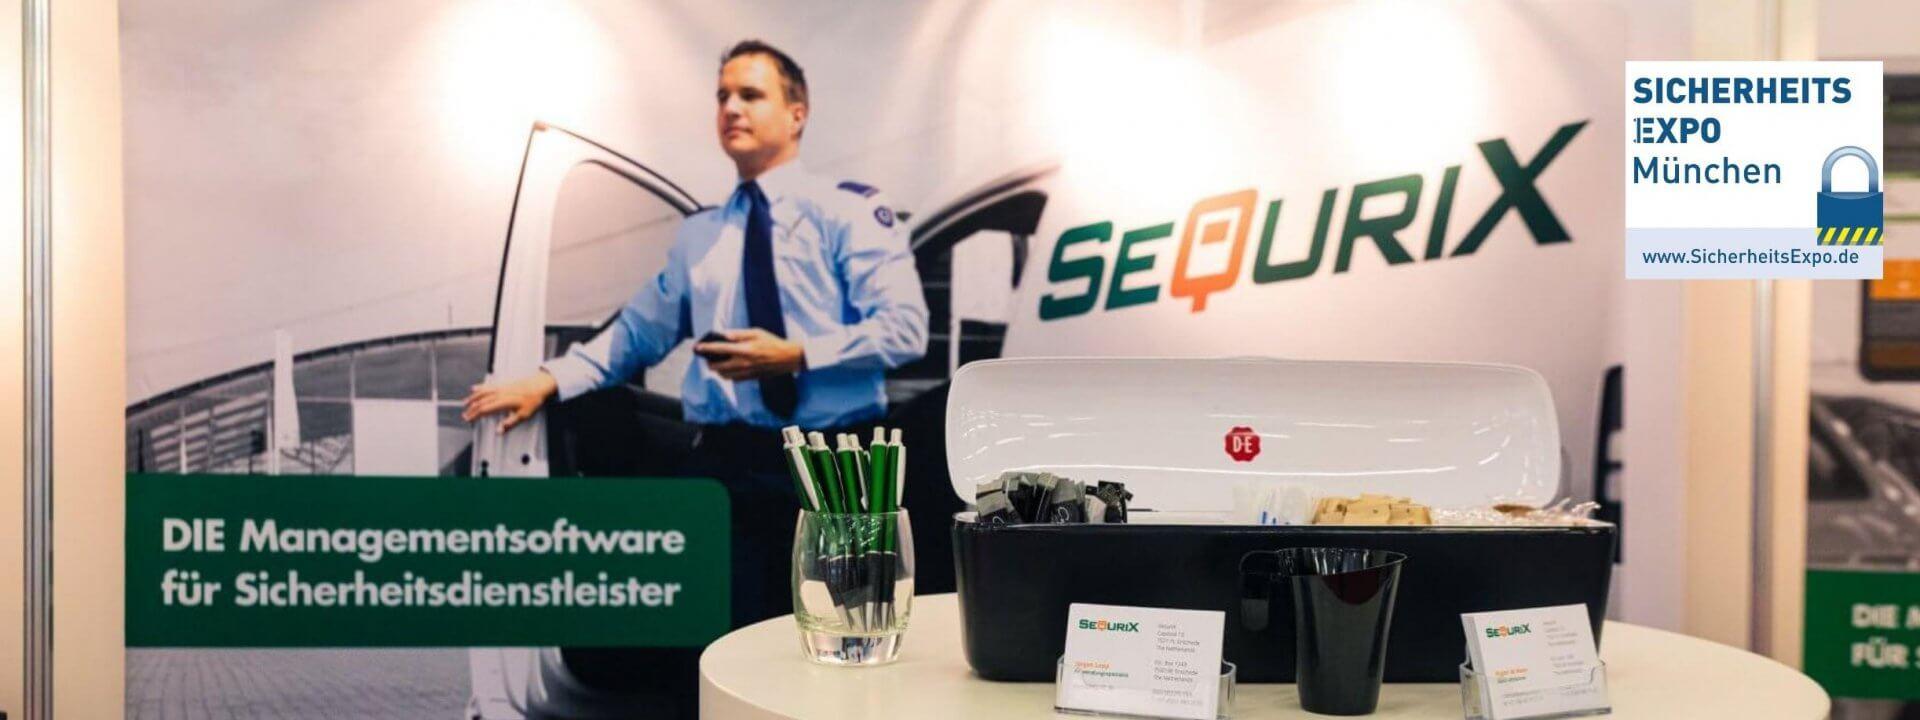 SicherheitsExpo 2020 SequriX